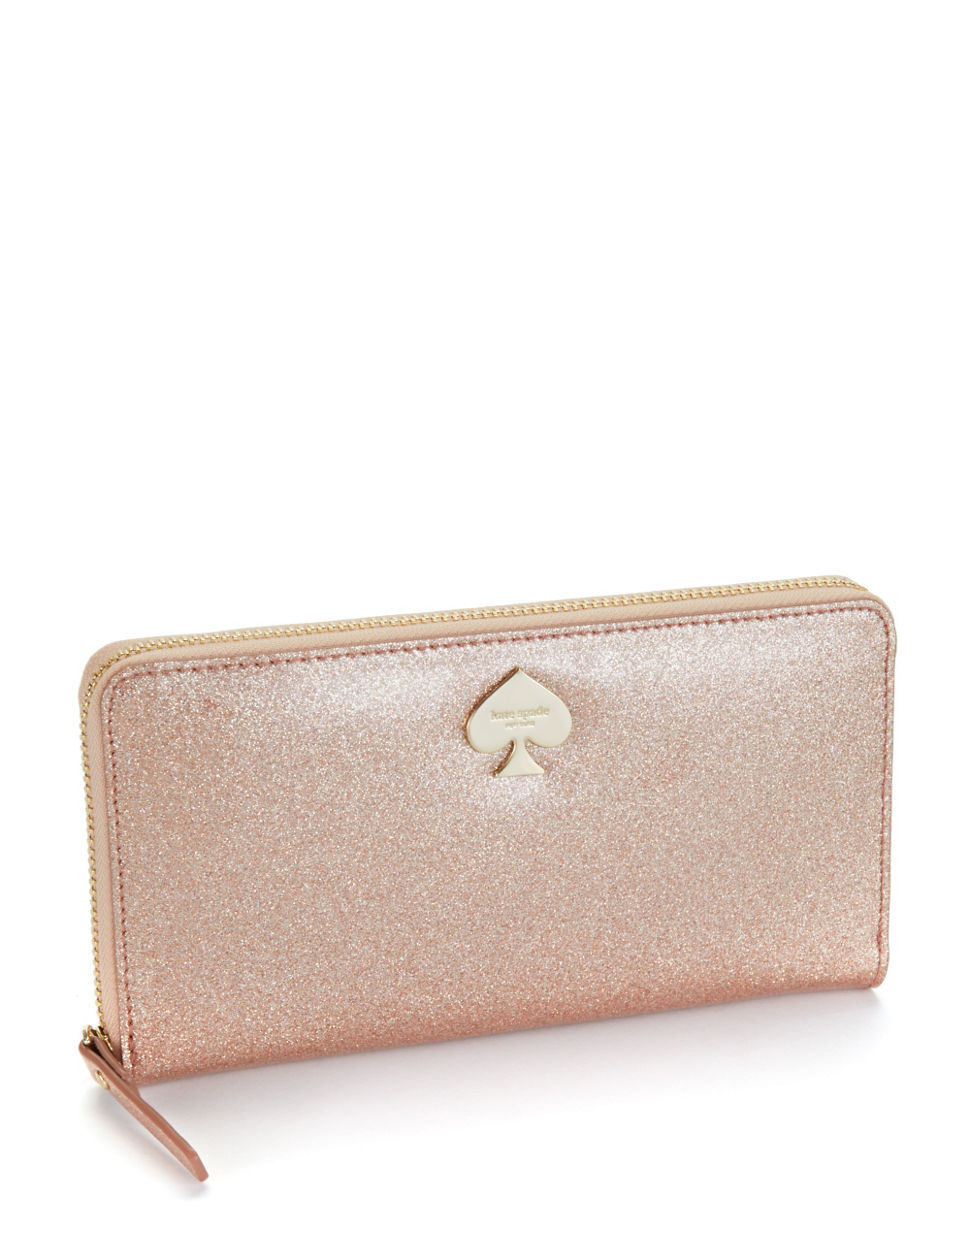 Kate Spade Lacey Glitter Bug Wallet in Metallic - Lyst